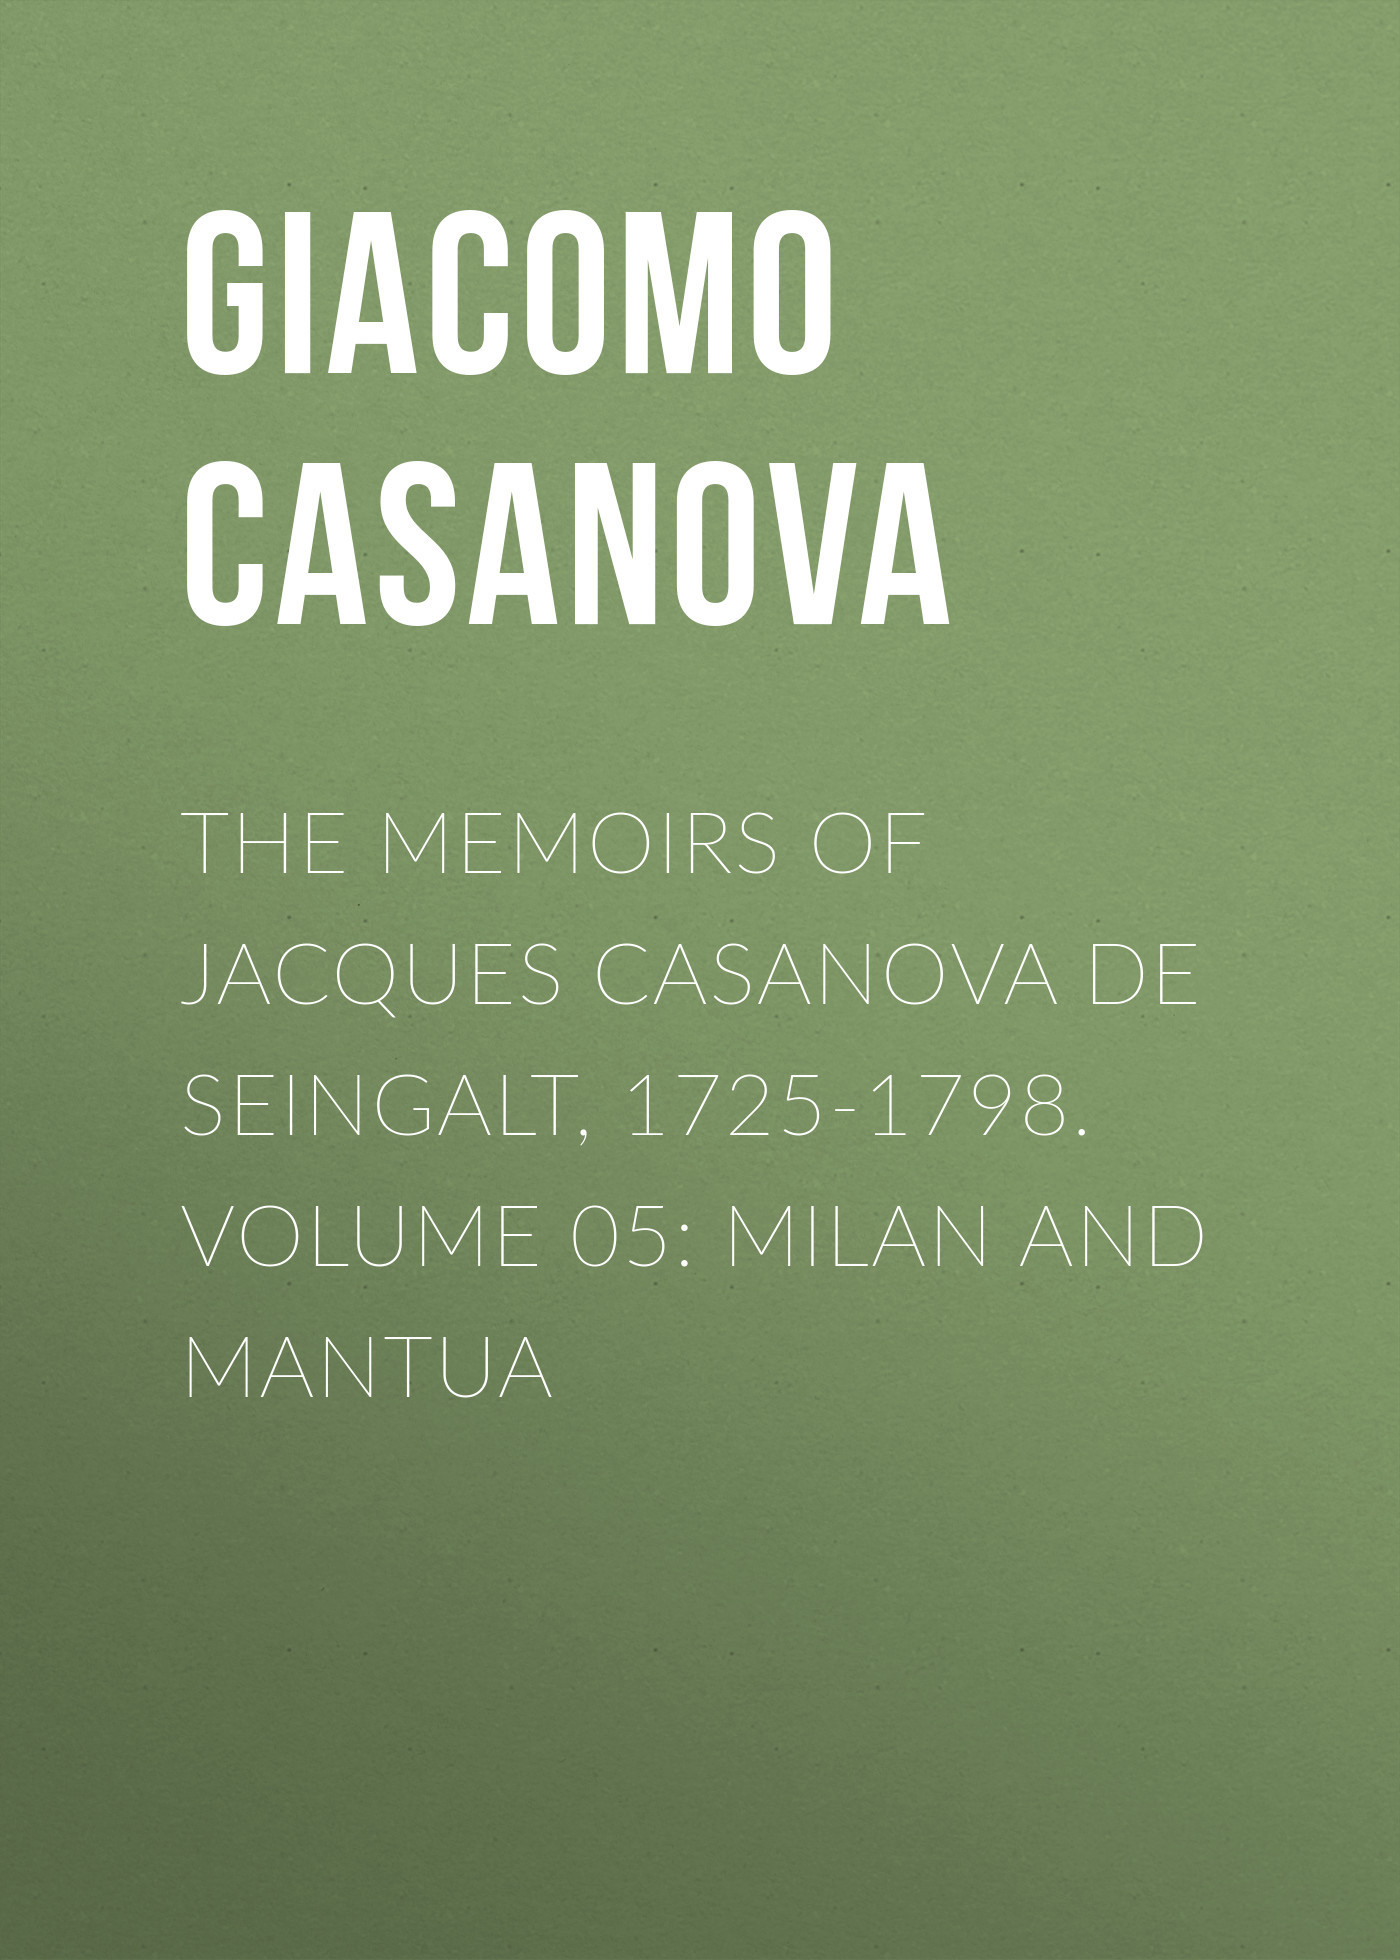 Giacomo Casanova The Memoirs of Jacques Casanova de Seingalt, 1725-1798. Volume 05: Milan and Mantua anthony hamilton the memoirs of count grammont – volume 05